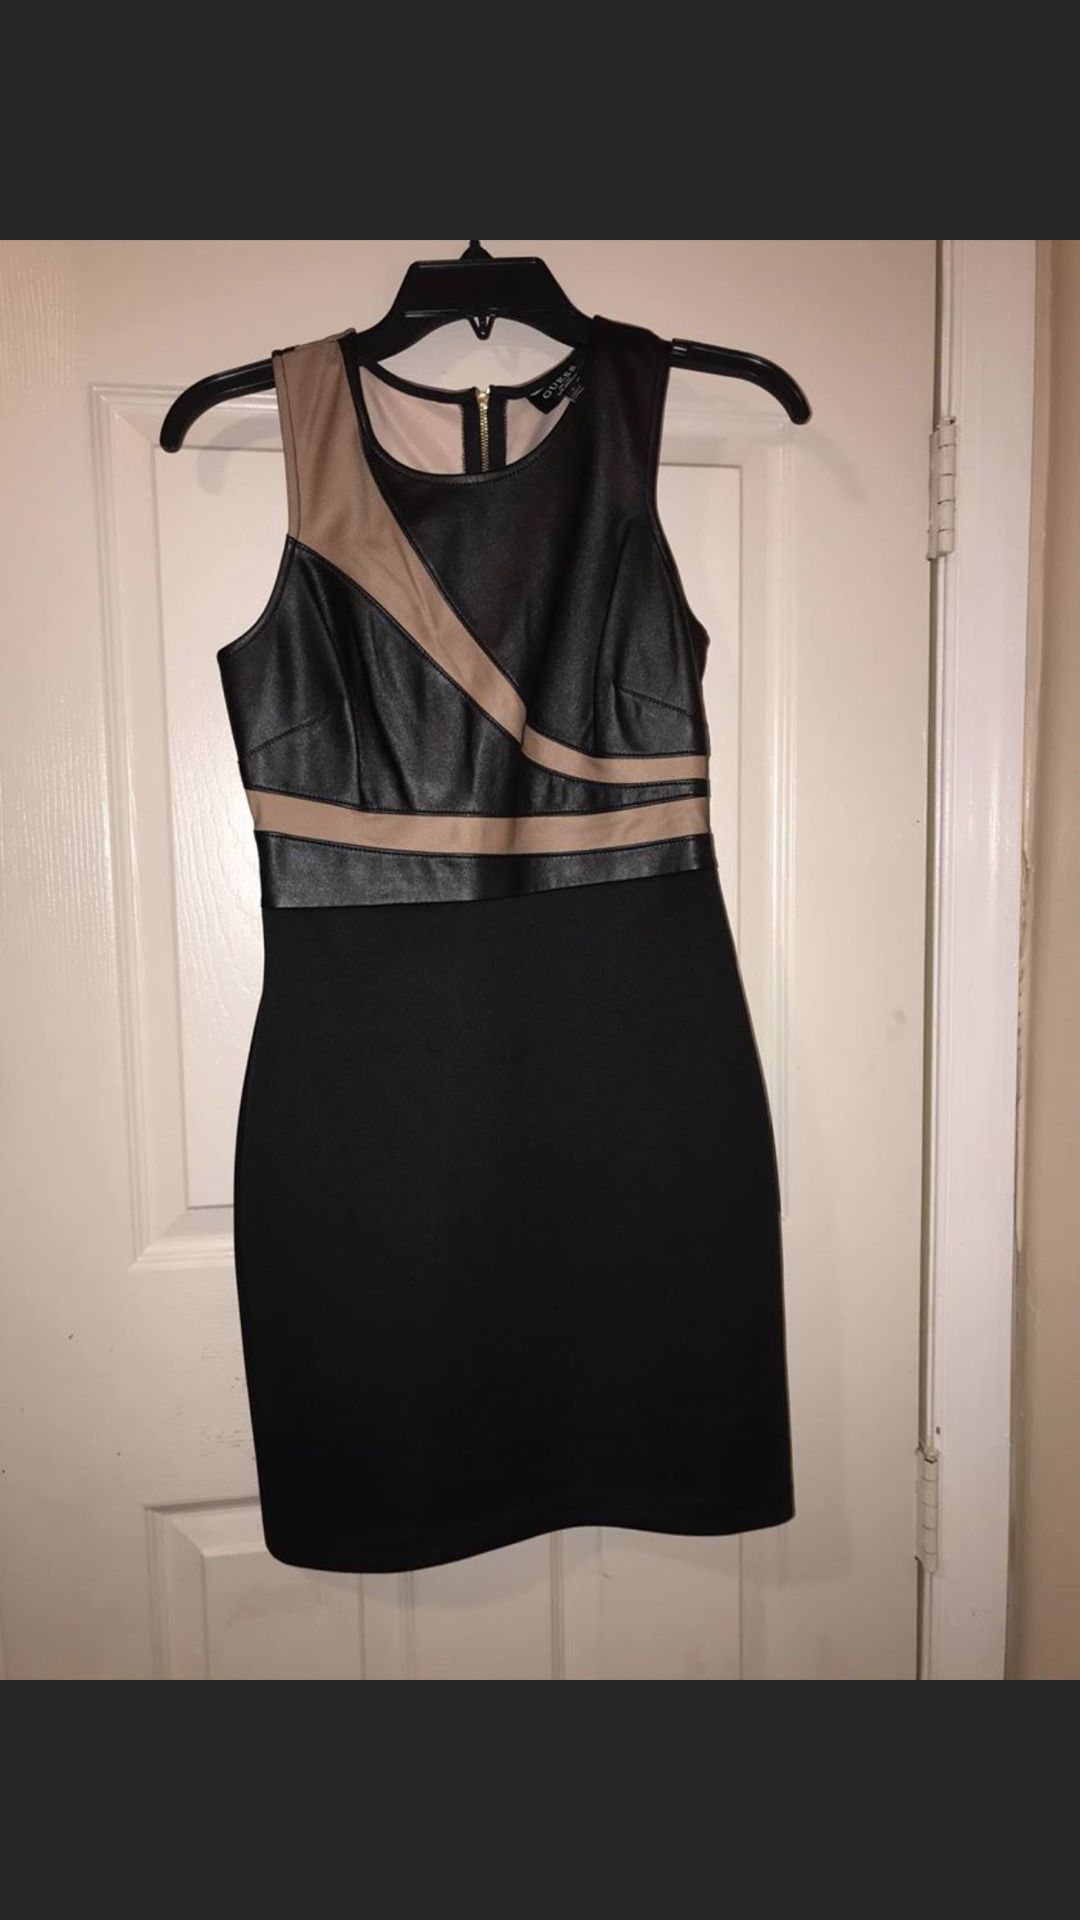 Guess short black dress | Size 2